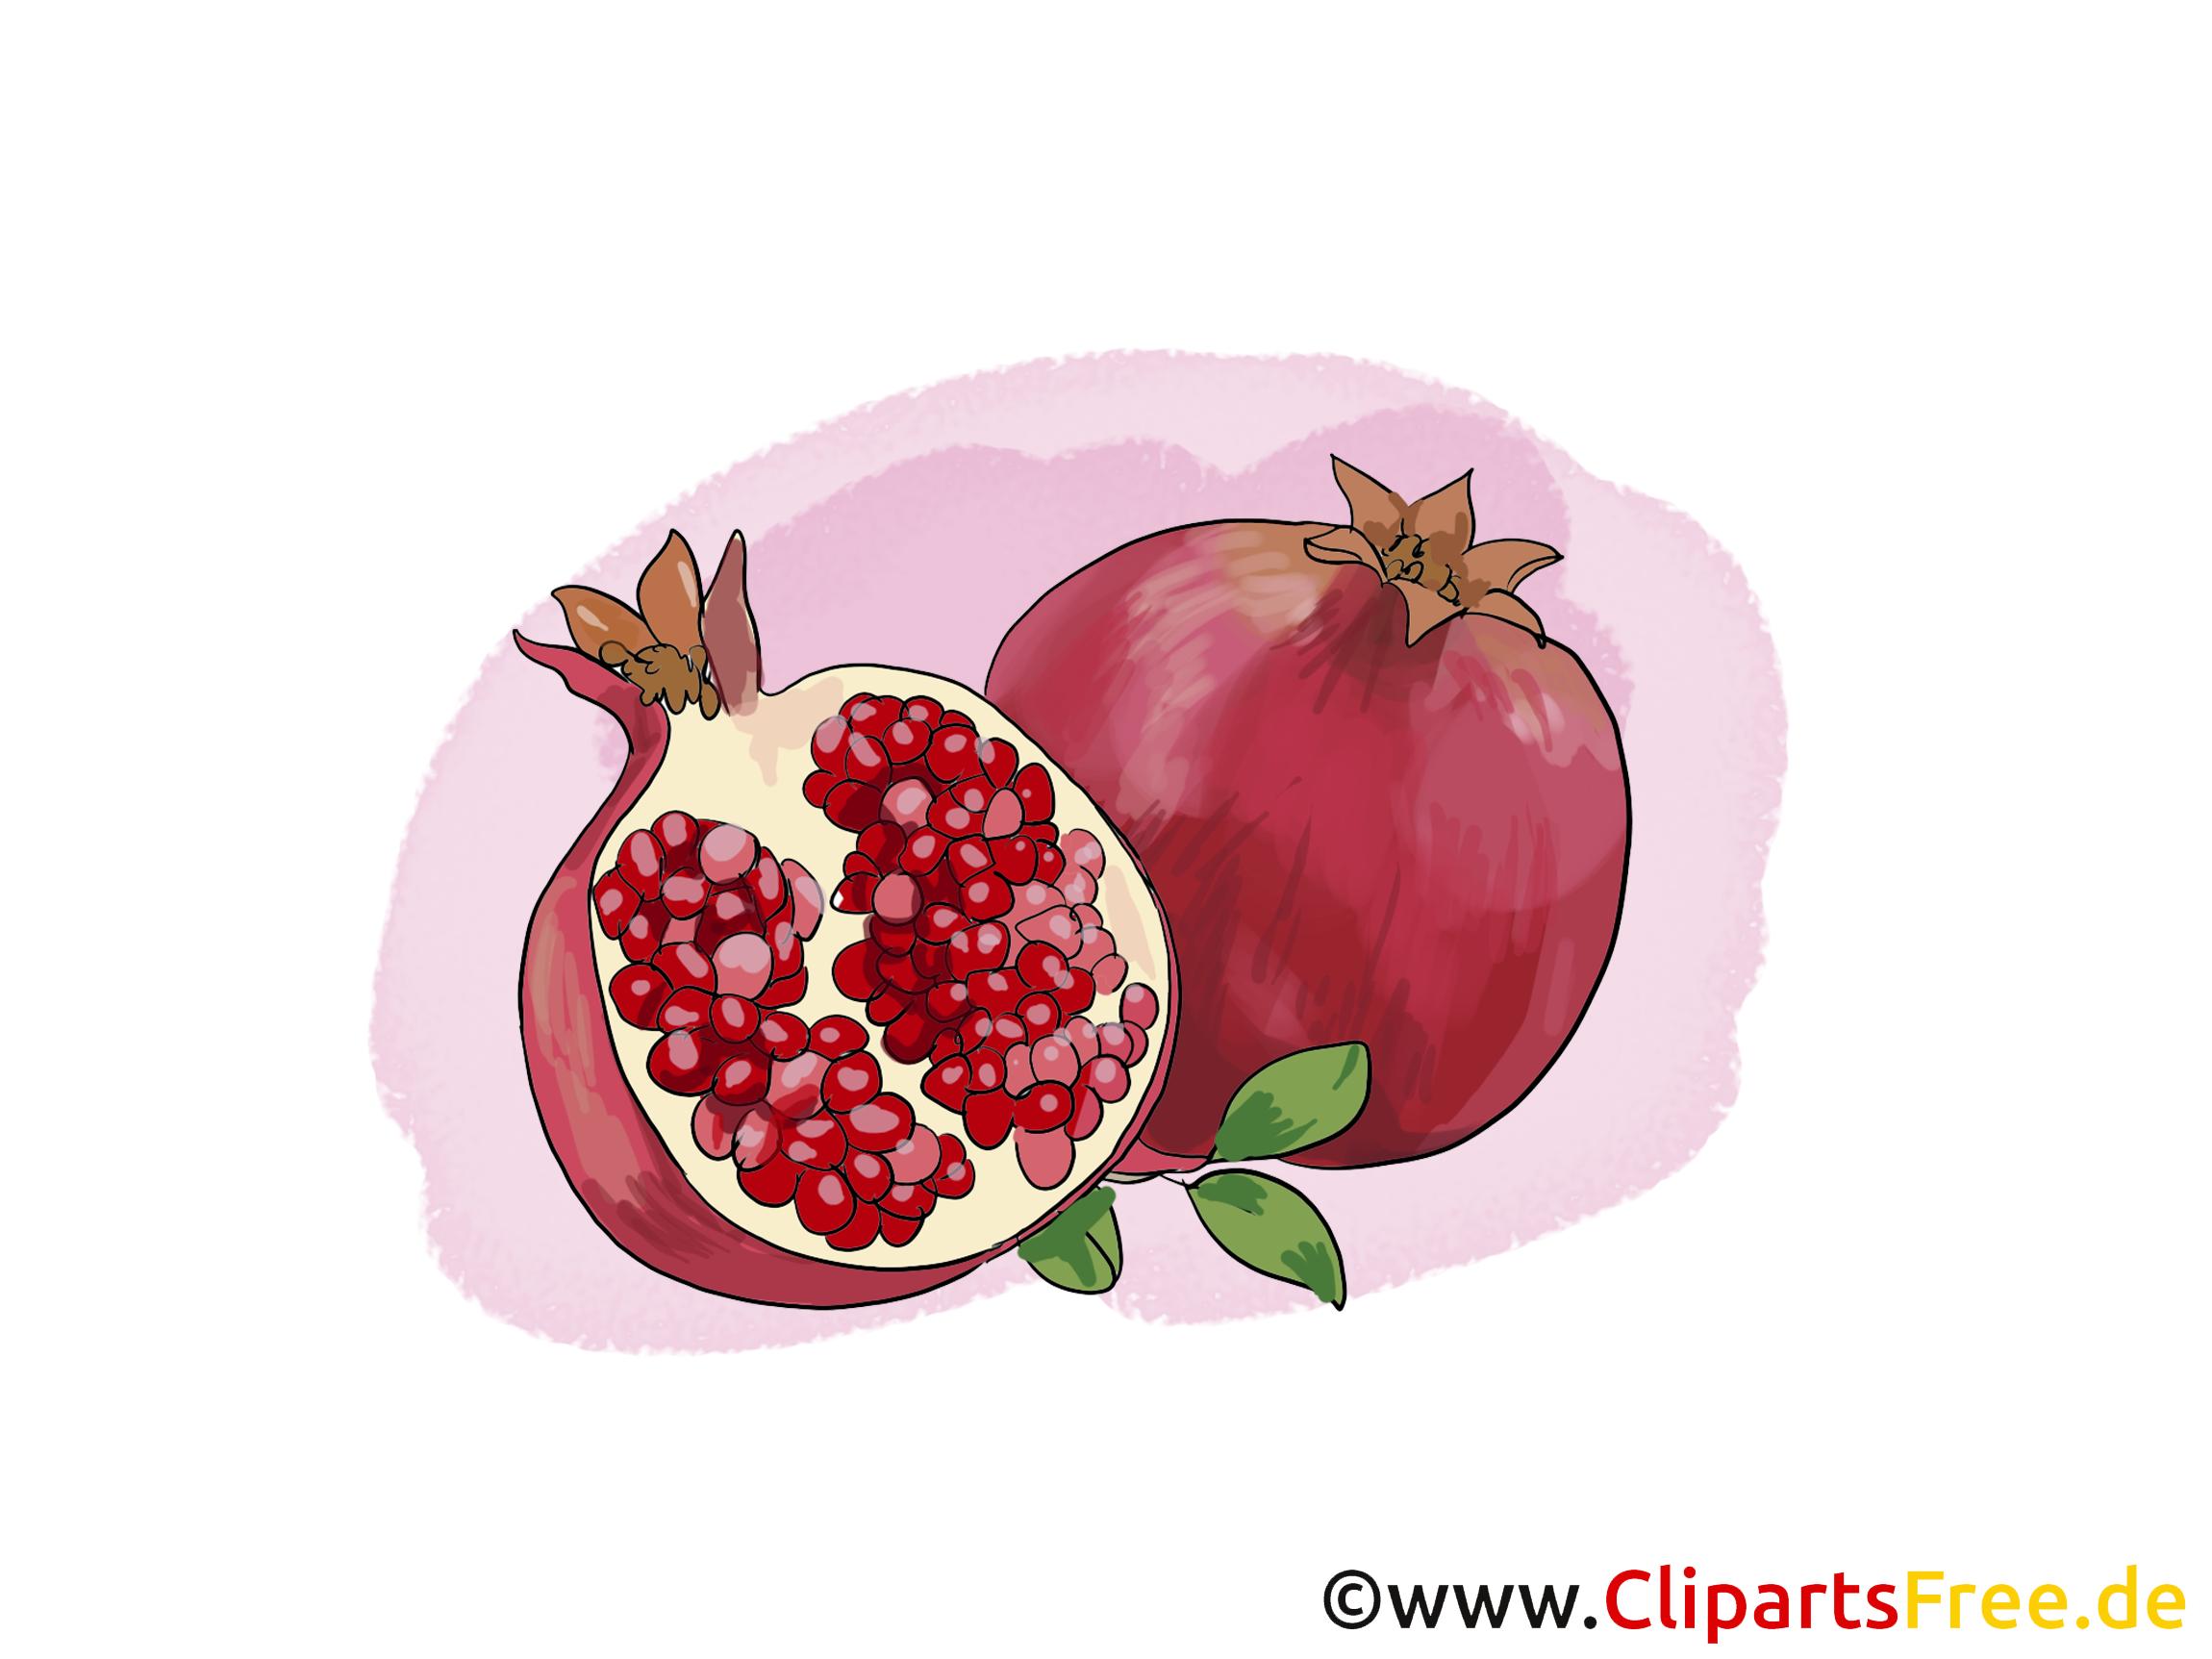 Grenade dessin gratuit fruits image fruits et l gumes dessin picture image graphic clip - Grenade fruit dessin ...